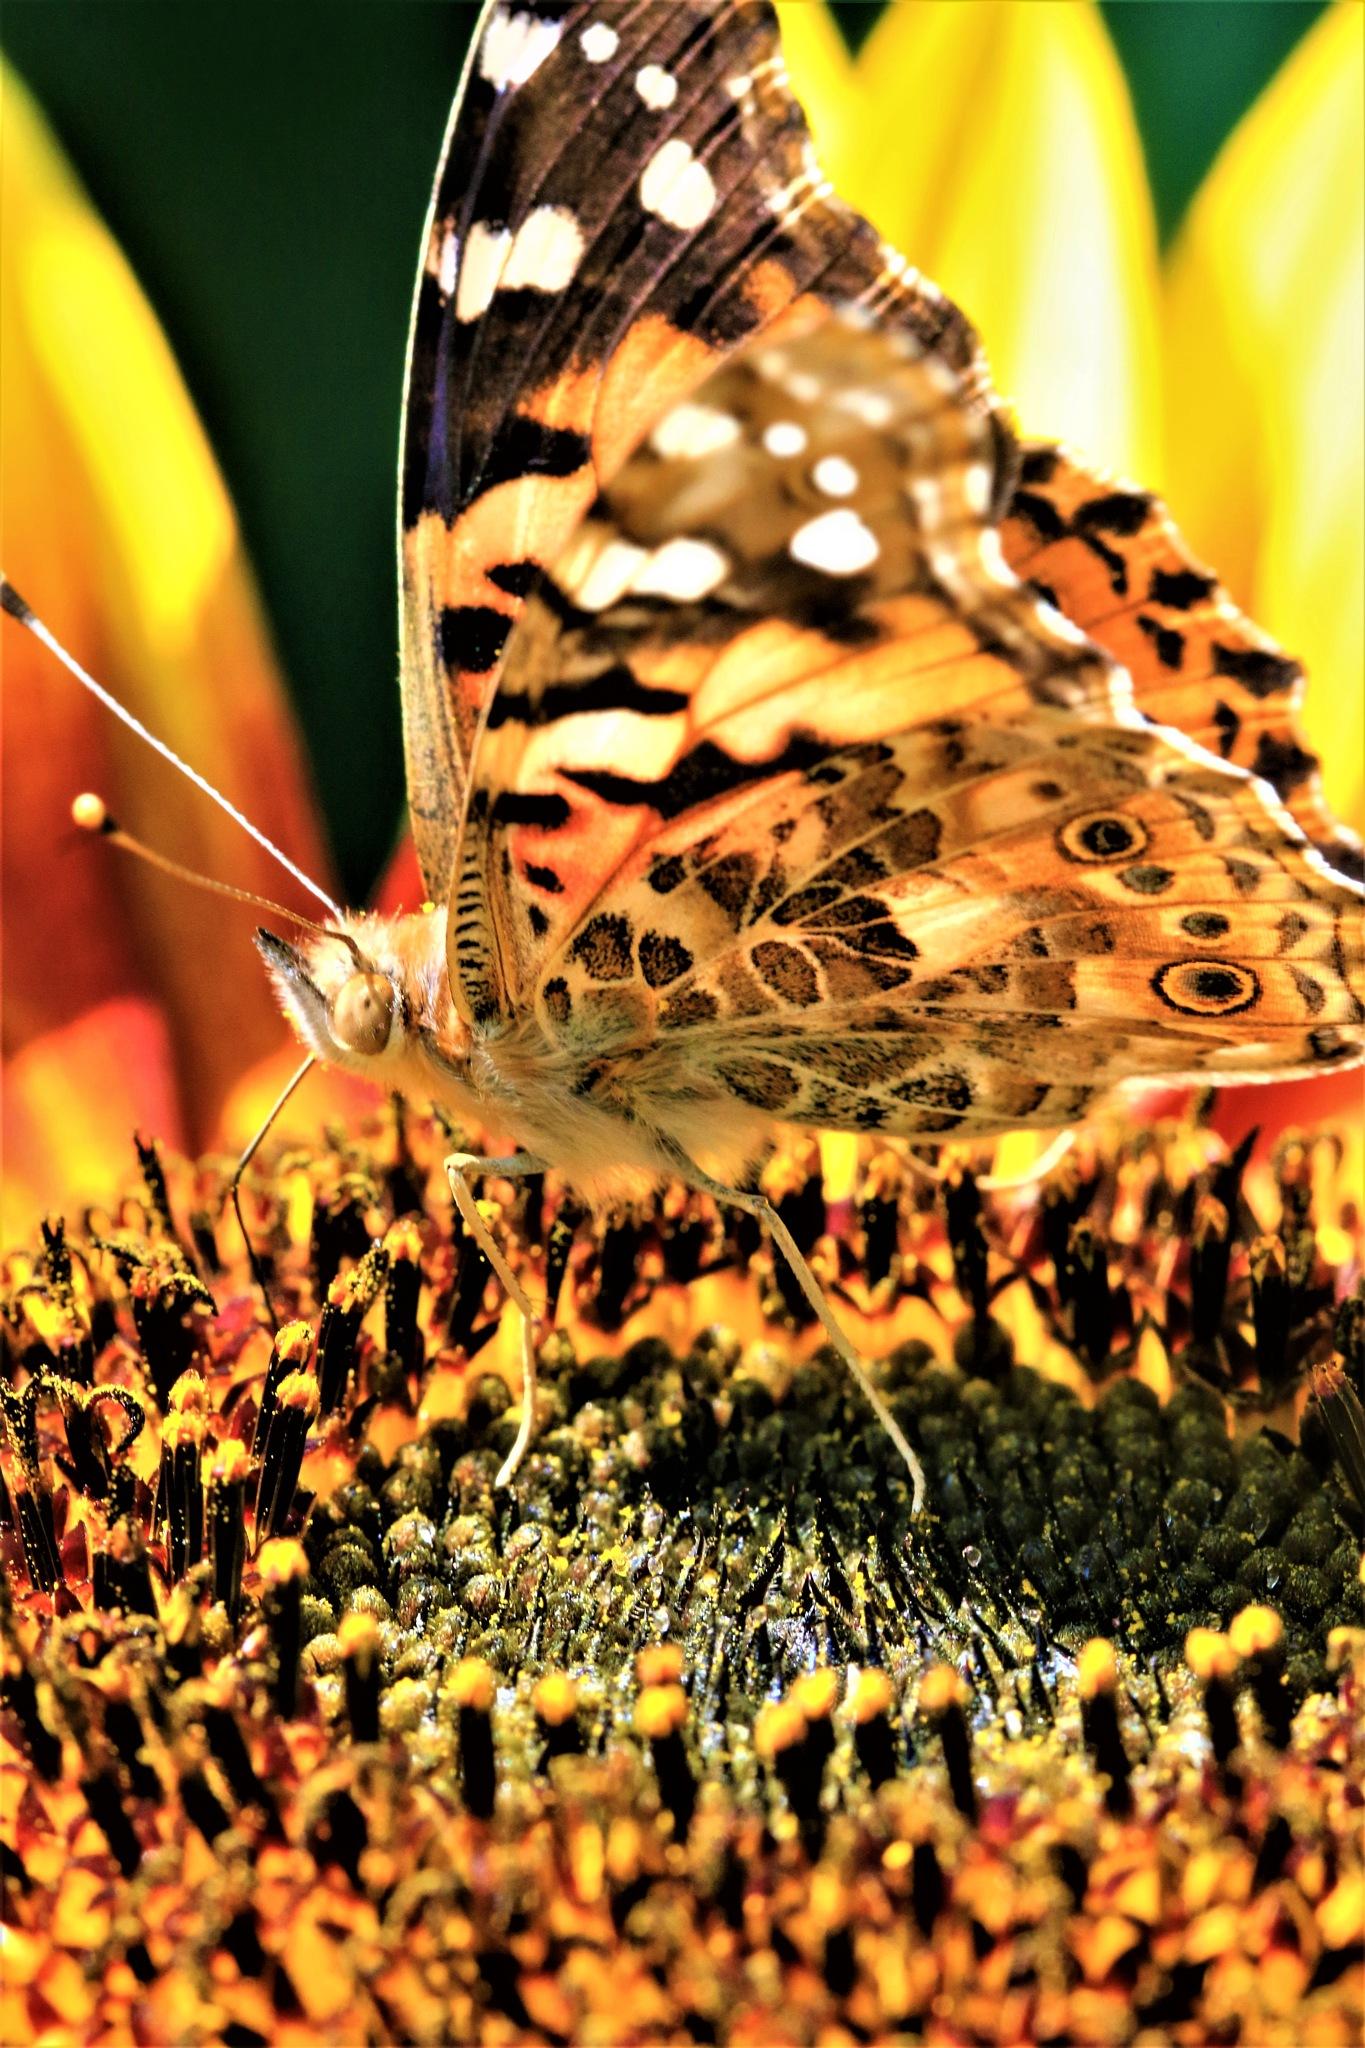 Butterfly on sunflower by Miloliidrifter